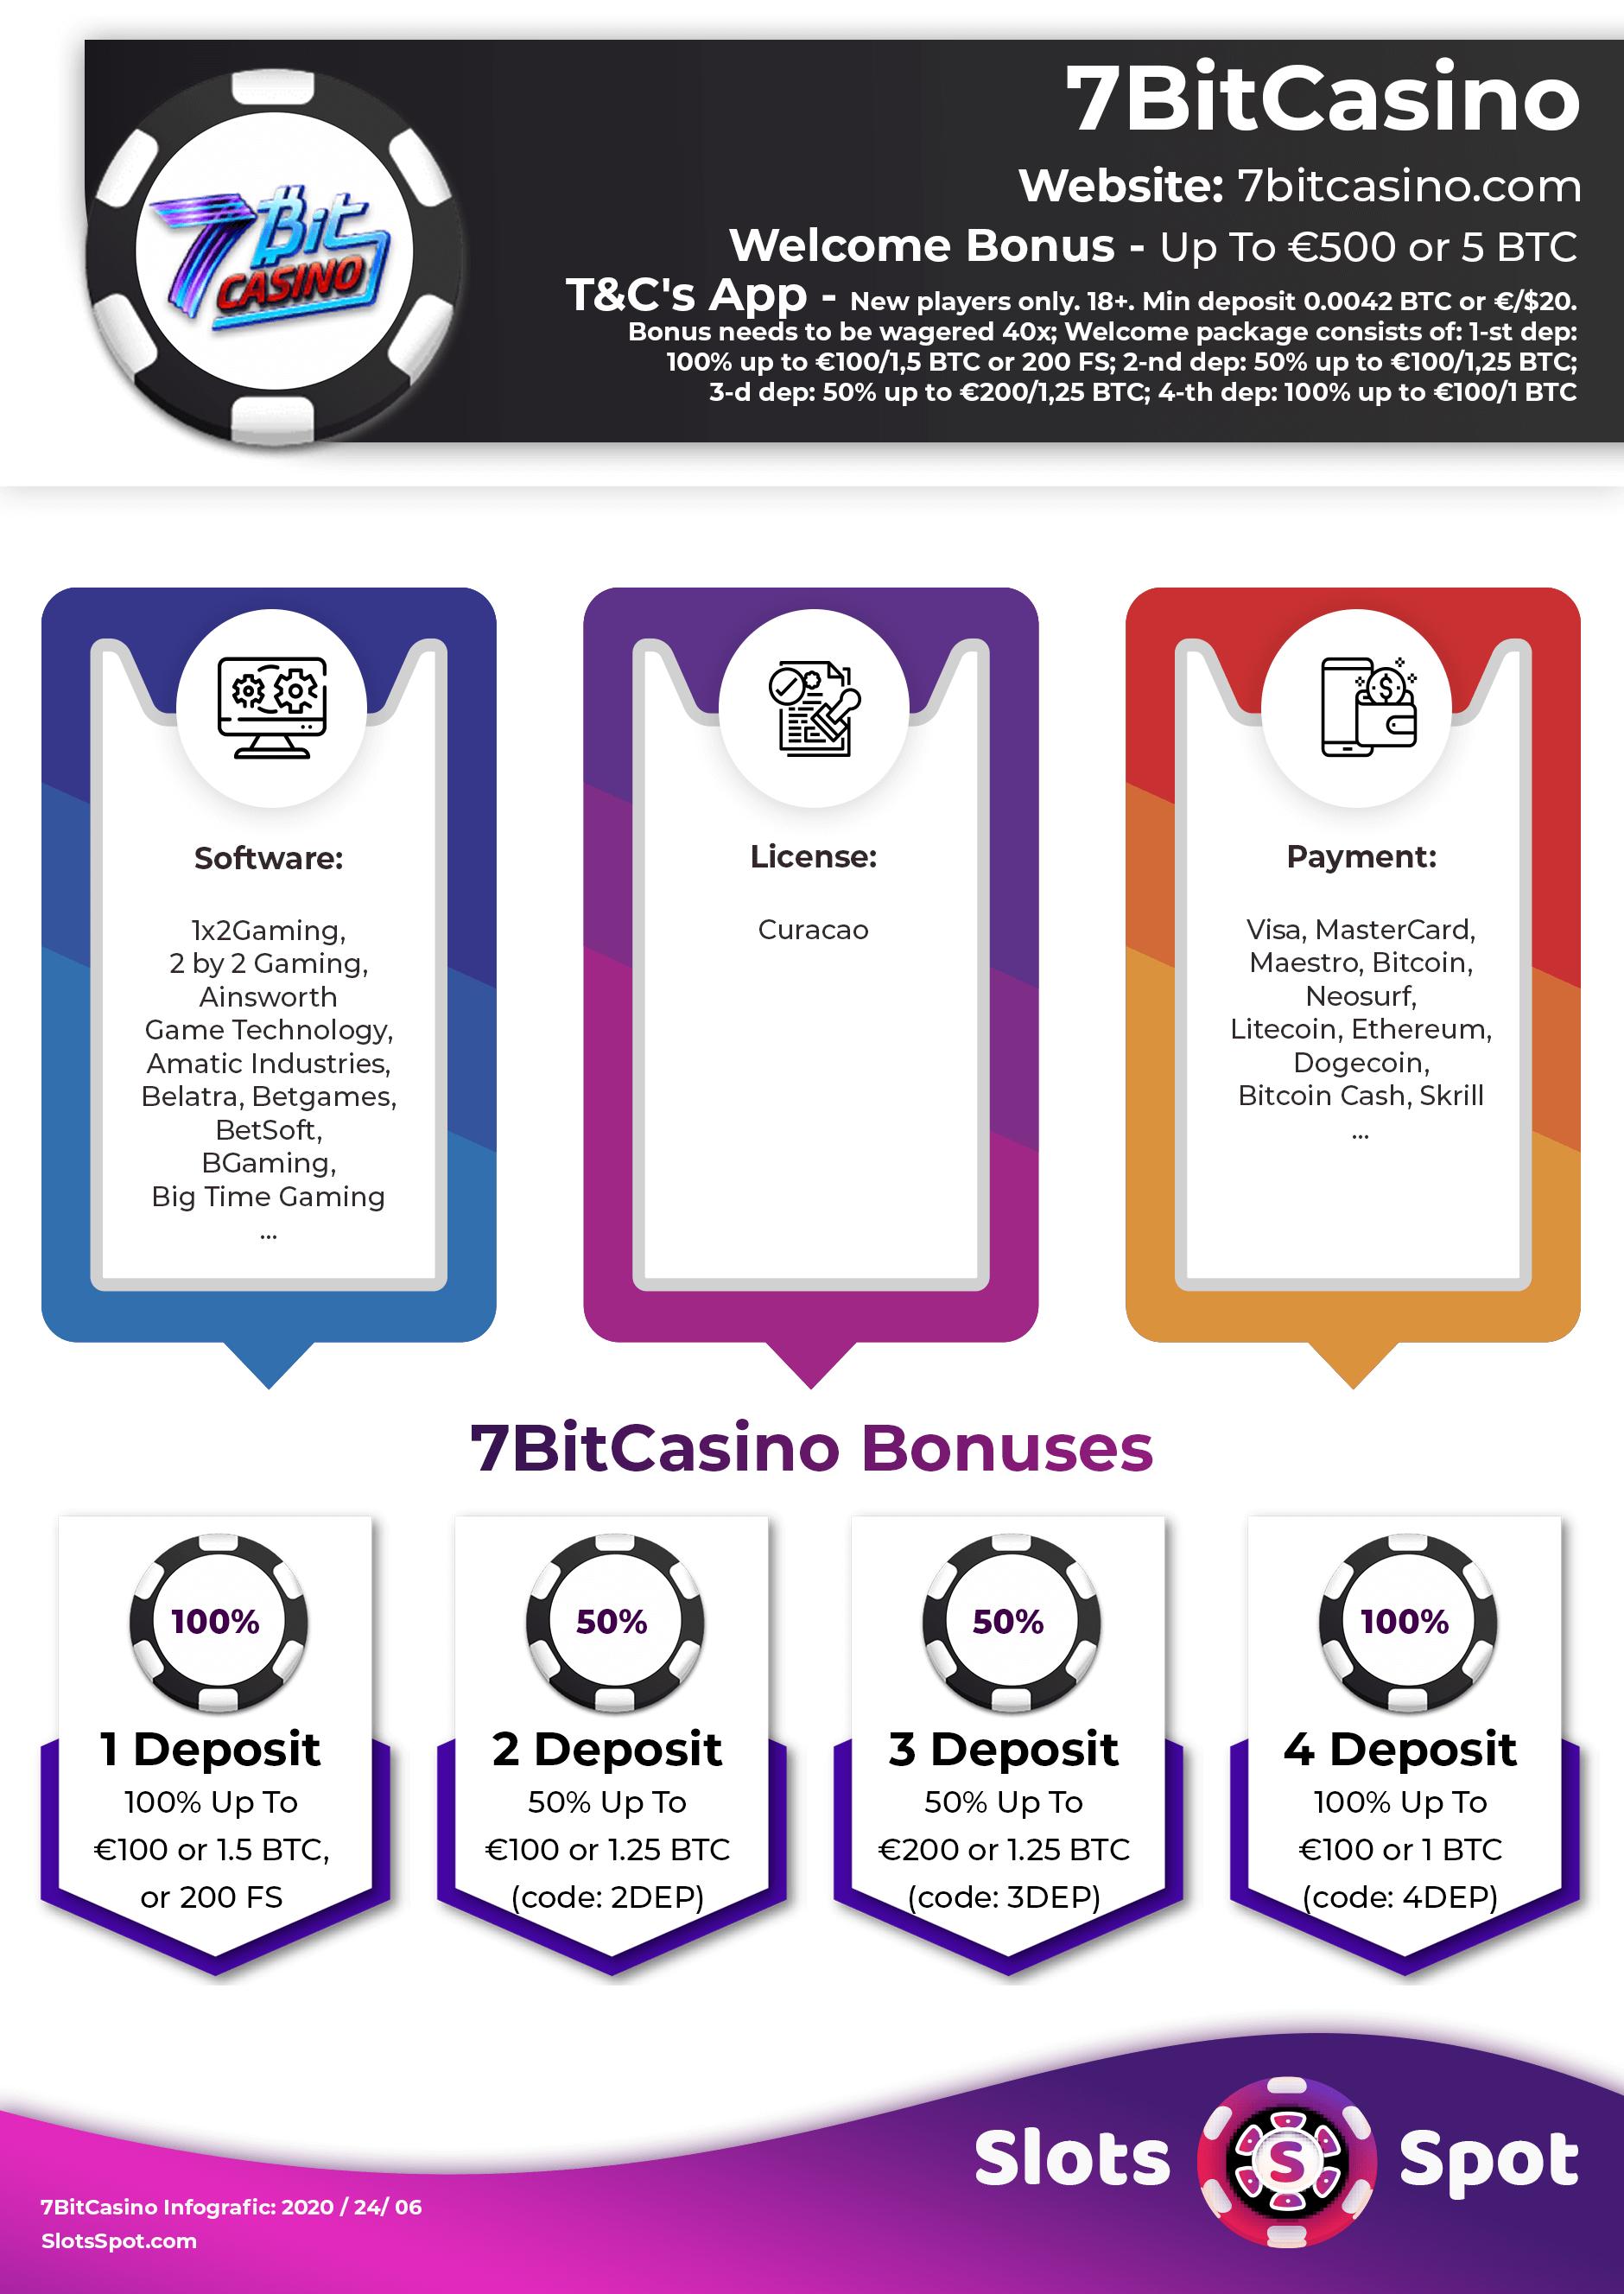 Bonza spins no deposit bonus 2020